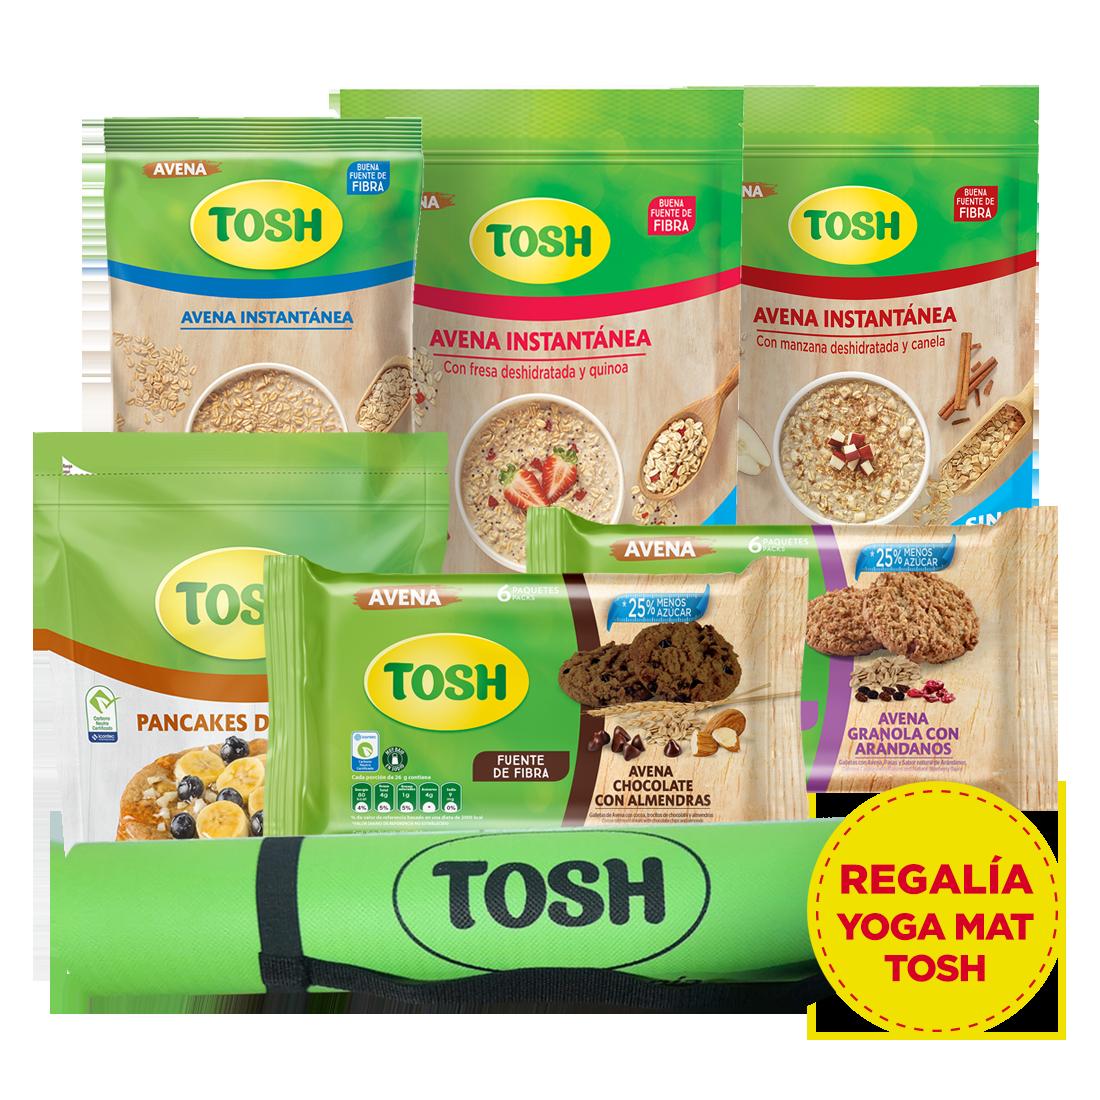 Tosh-Avena-1